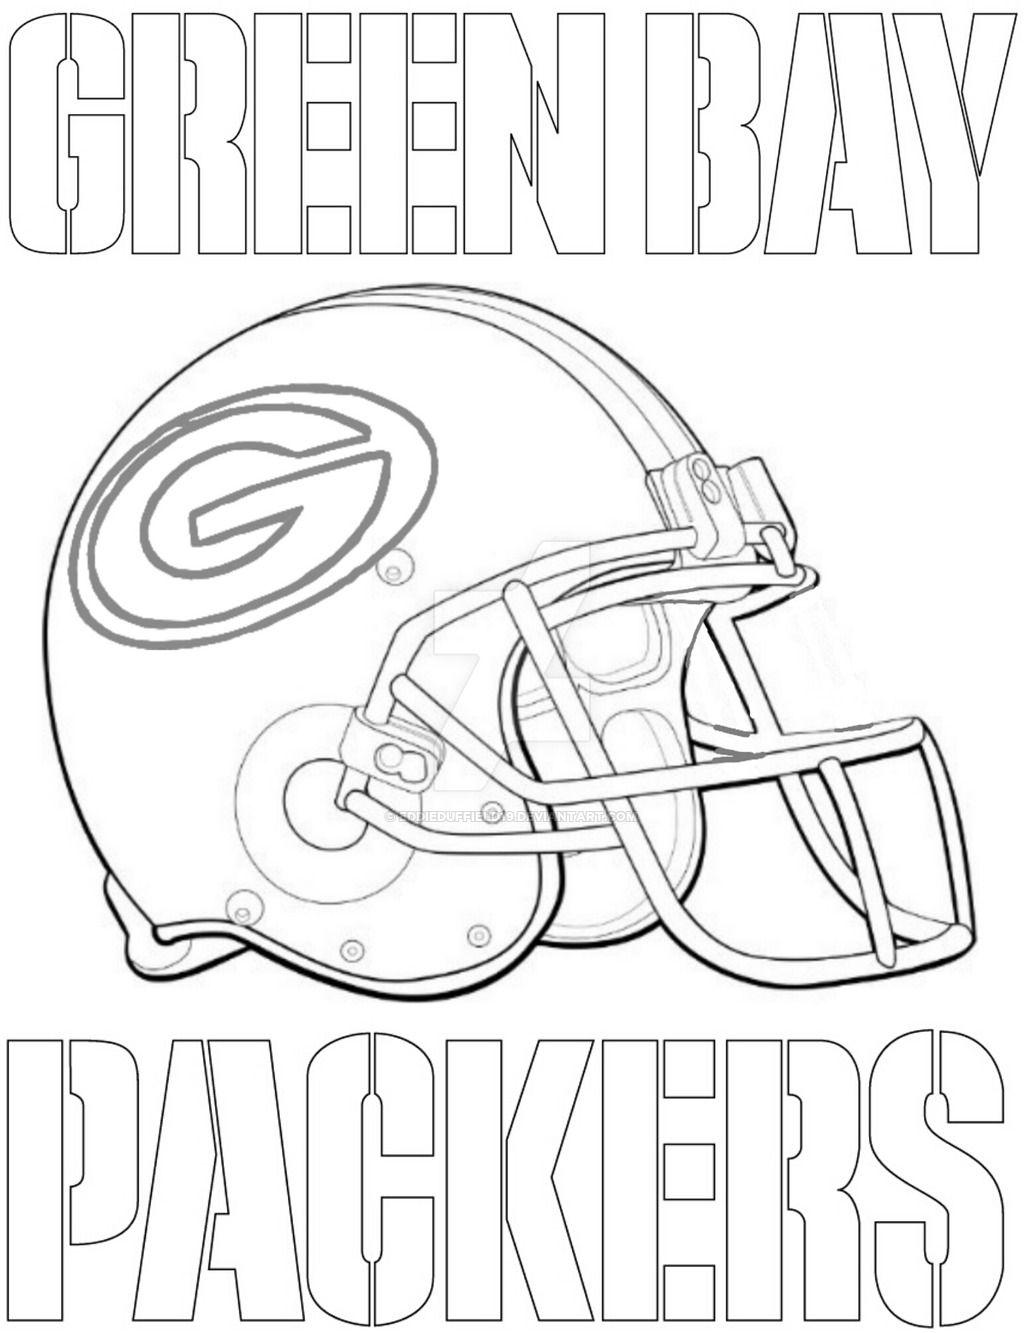 Packers Football Helmet Coloring Page